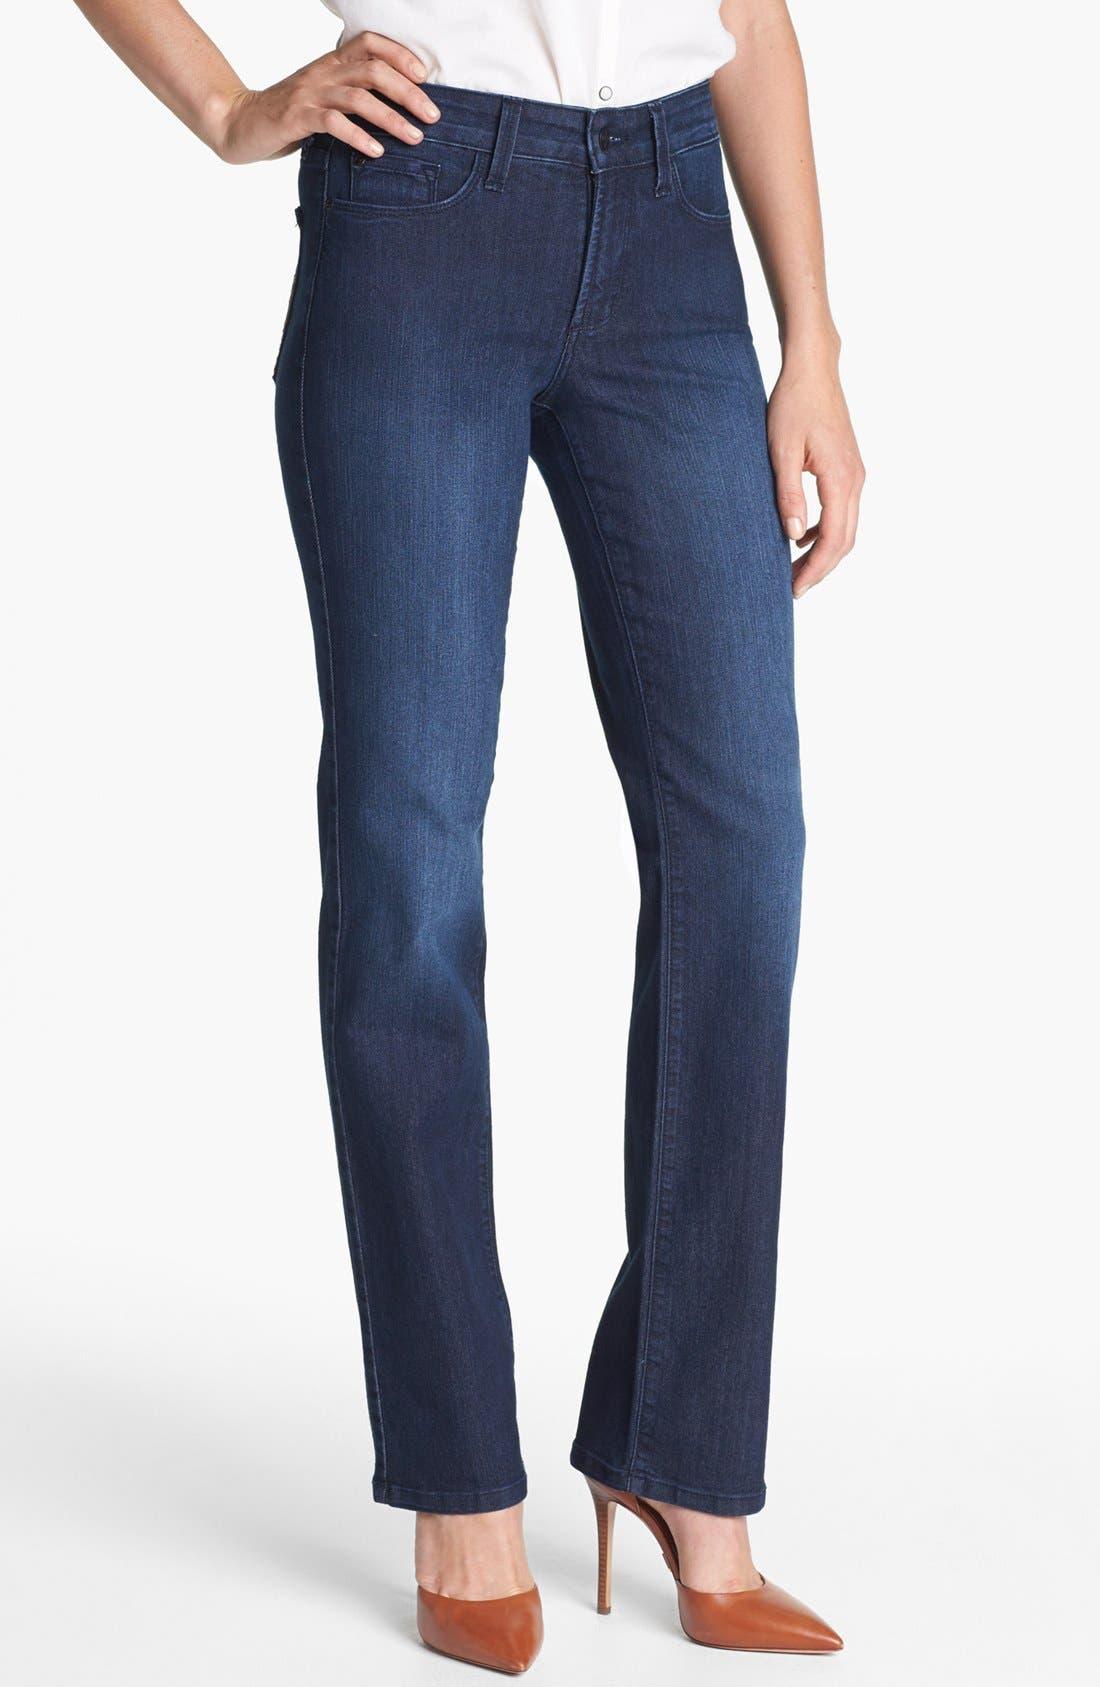 Main Image - NYDJ 'Marilyn' Stretch Straight Leg Jeans (Dana Point) (Petite)